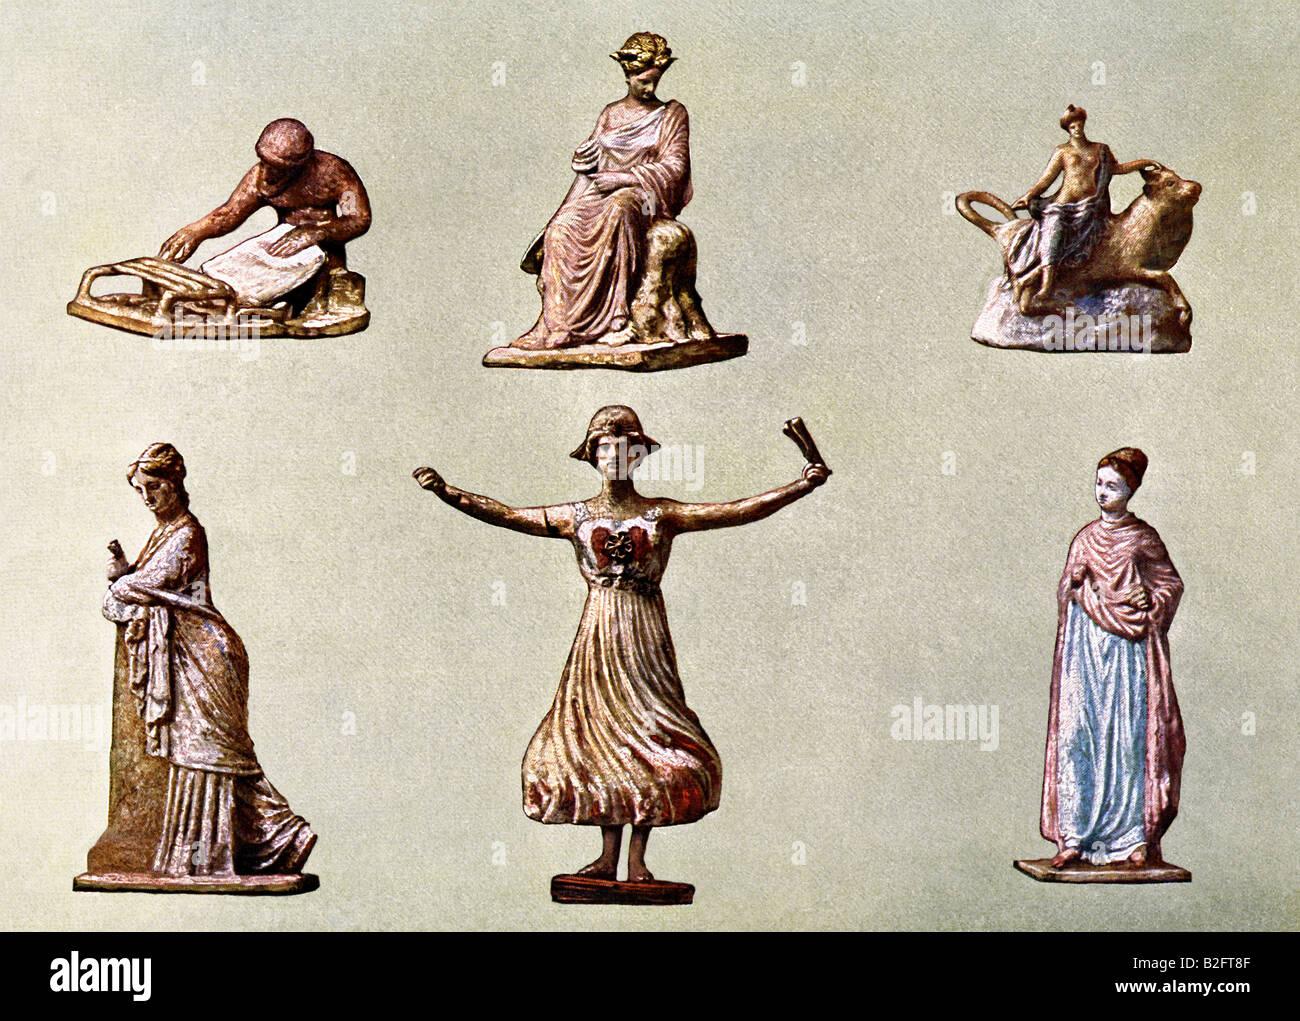 Painted Greek Figurines - Stock Image